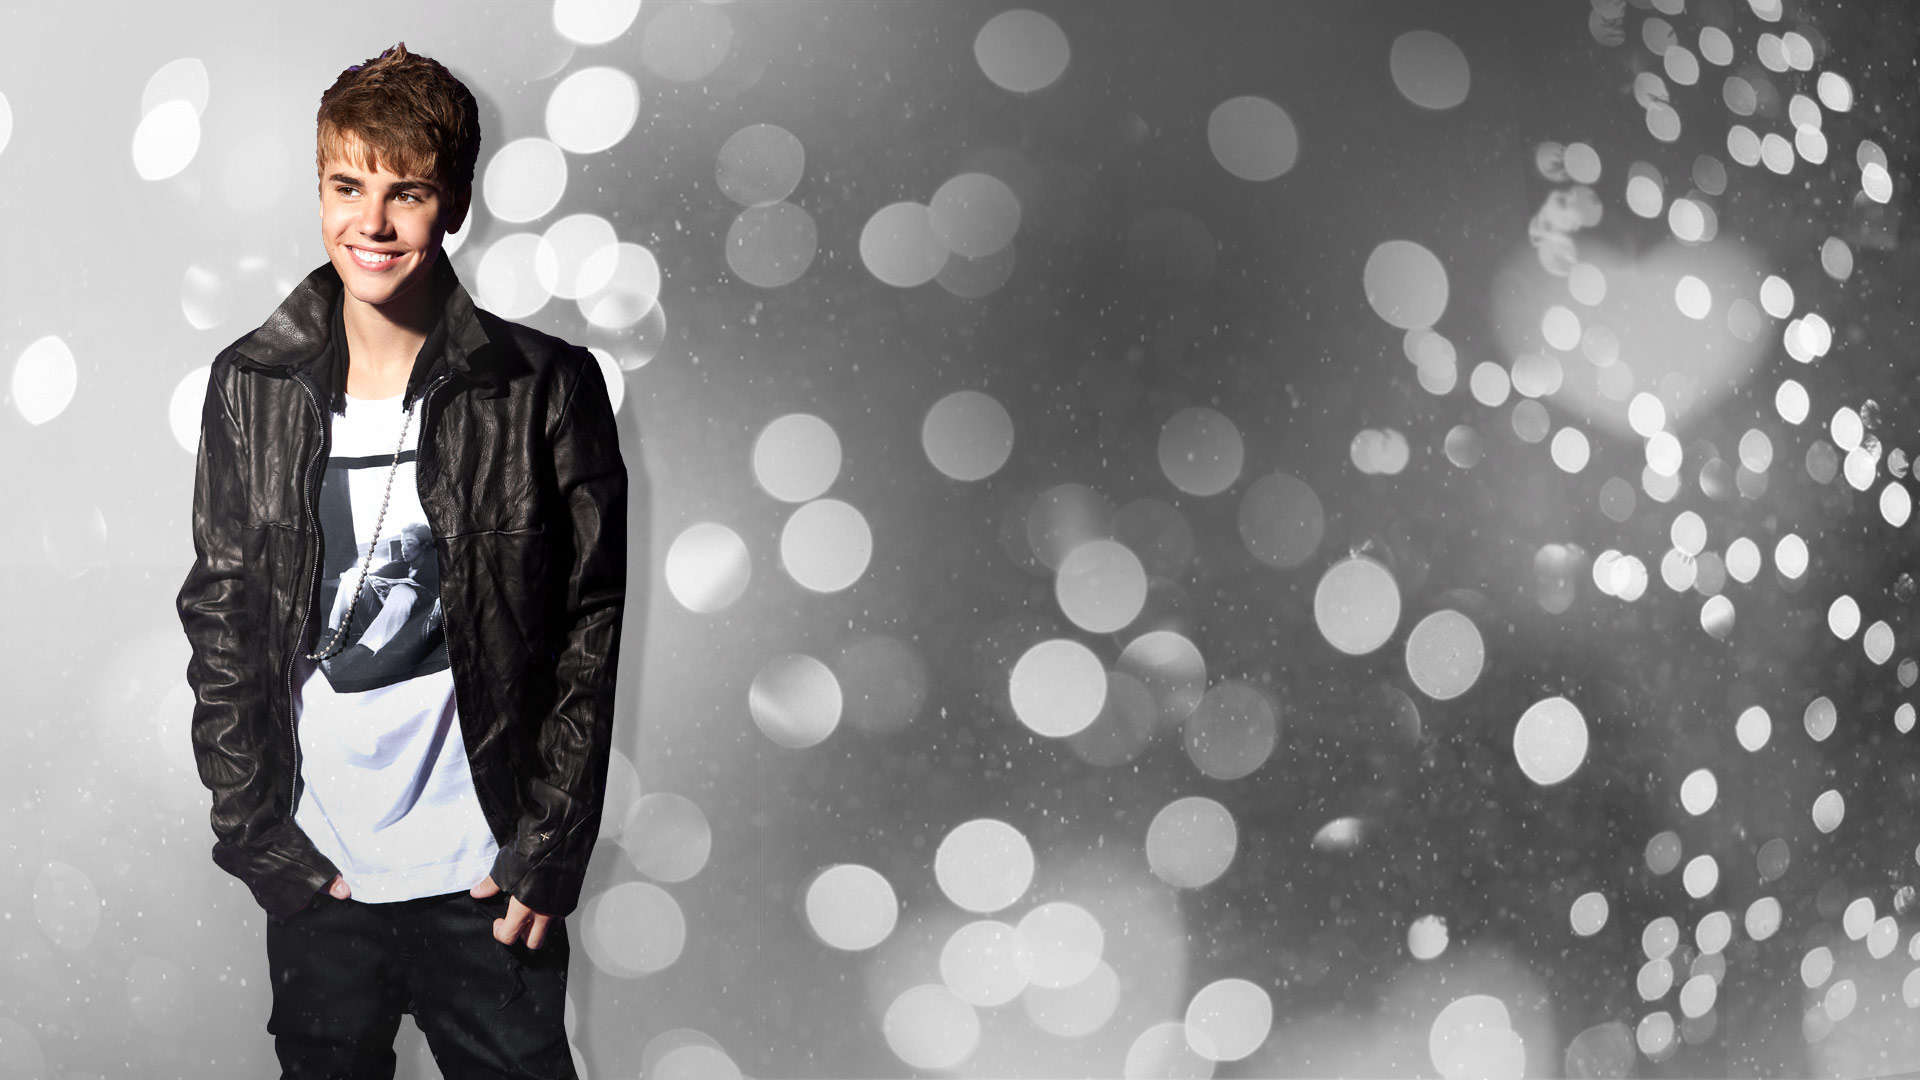 Cute Baby Boy Full Hd Wallpaper Fondos De Justin Bieber Wallpapers Y Fotos De Justin Bieber